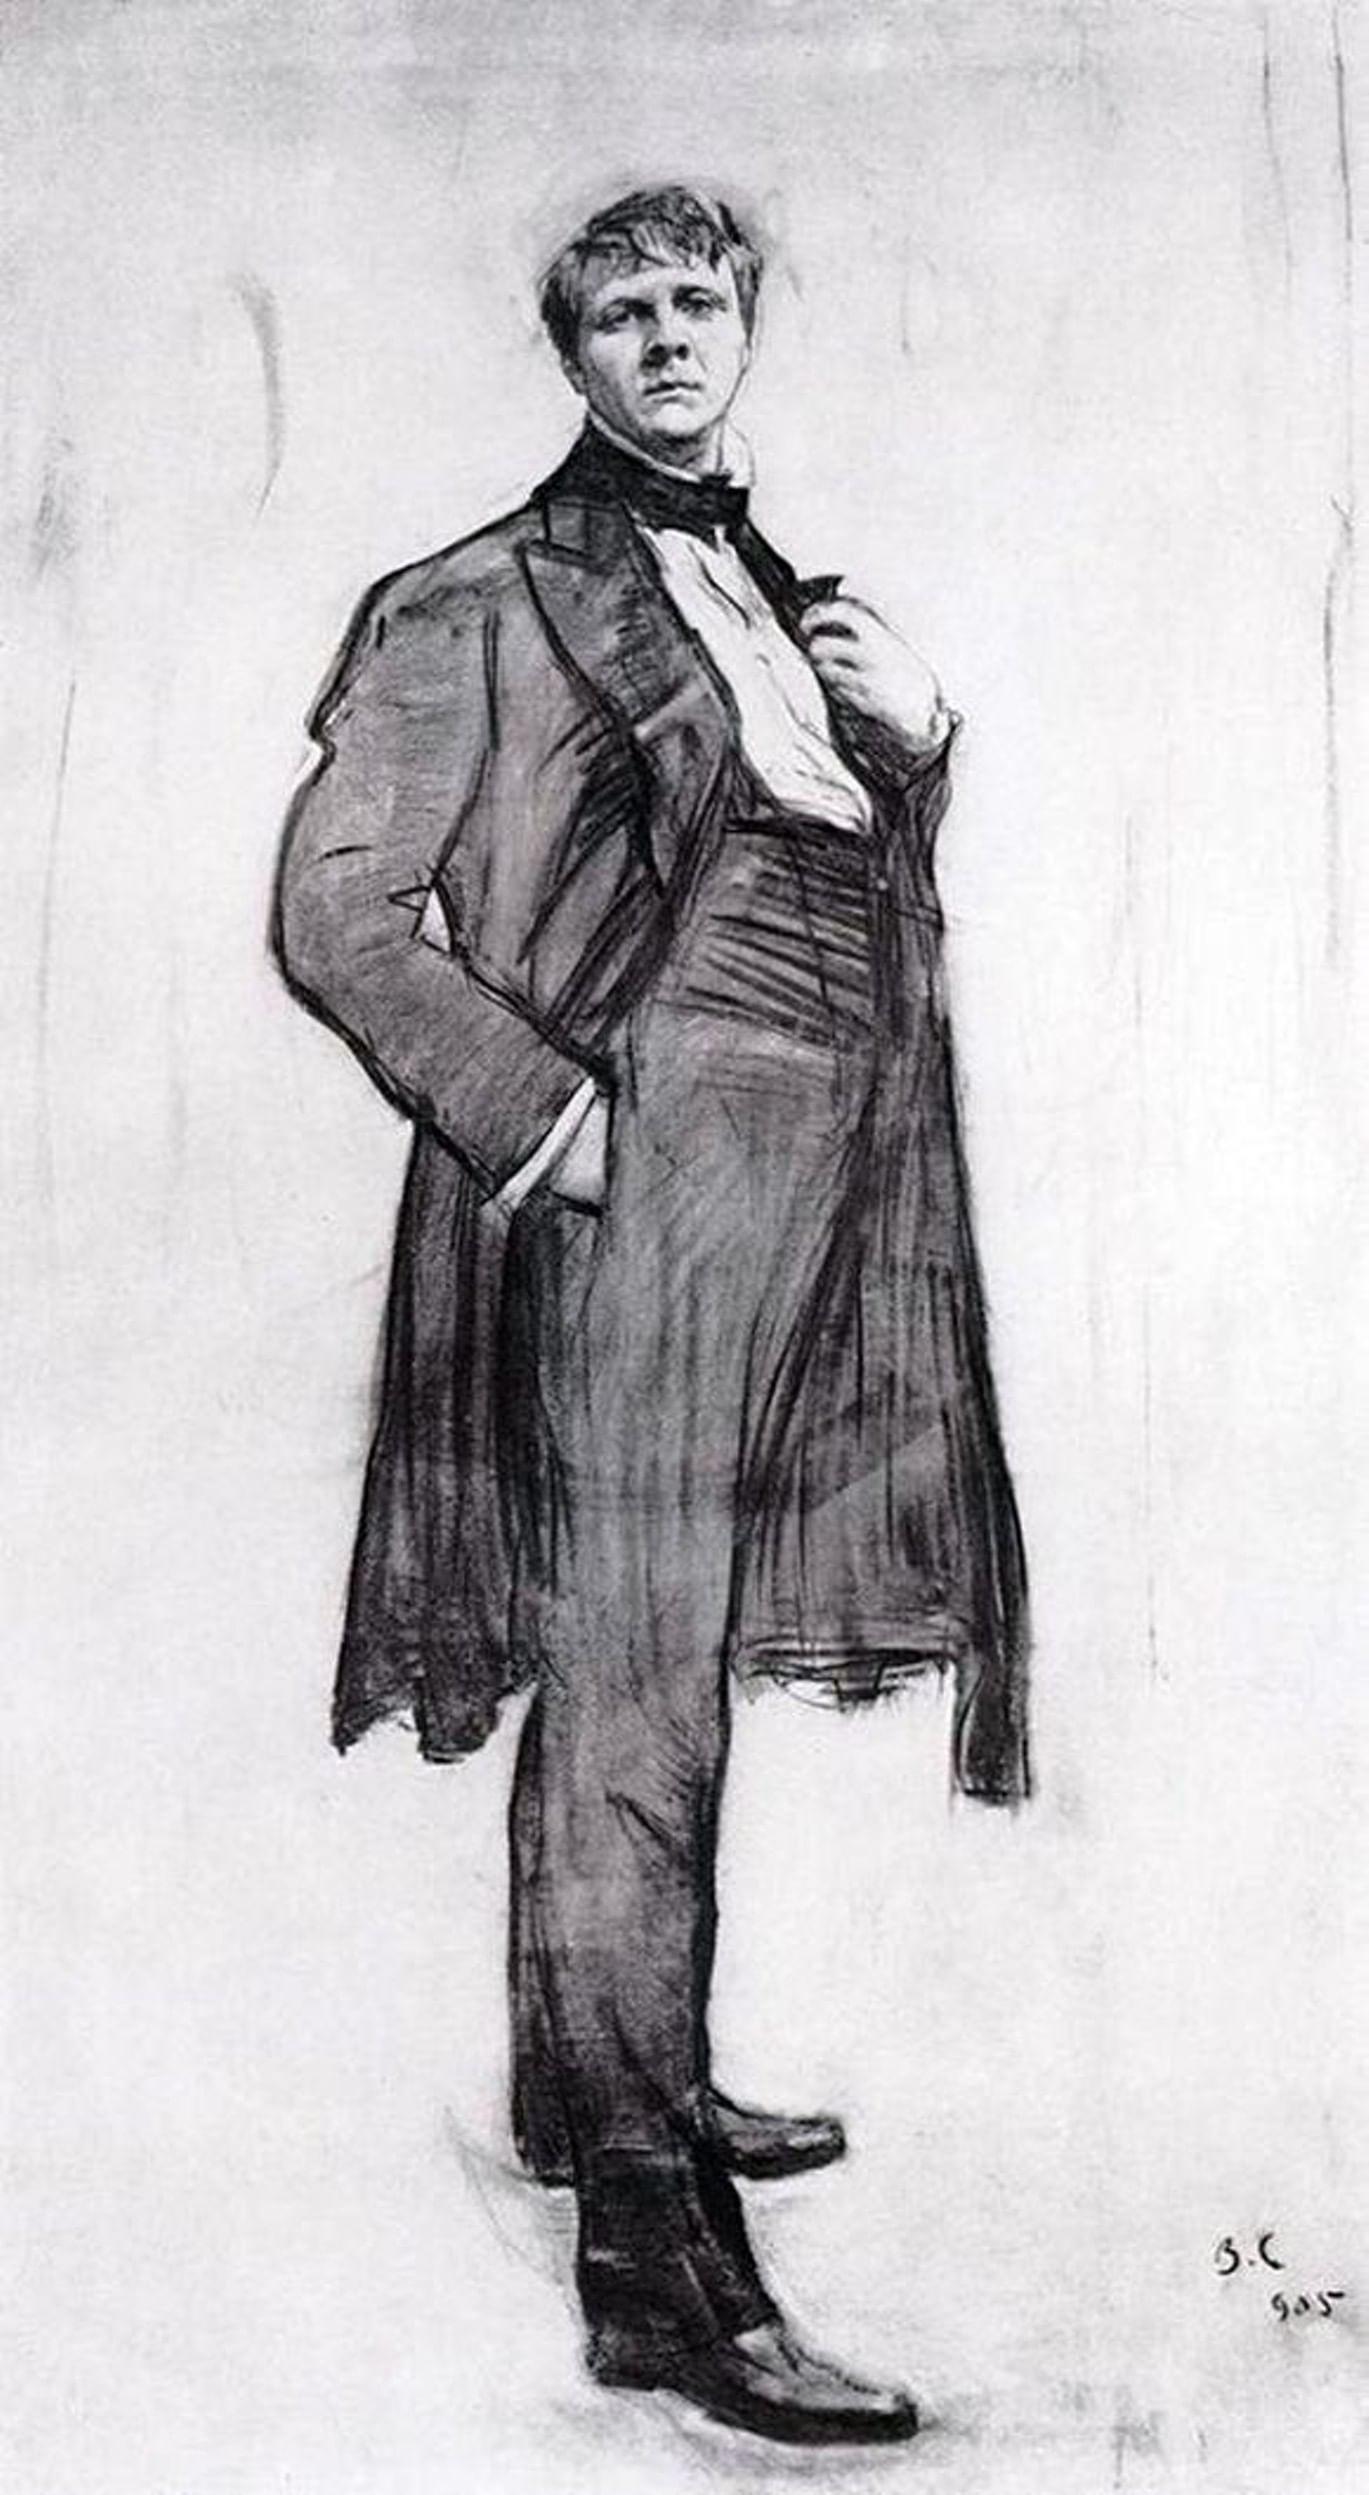 Фёдор Шаляпин: робкий великан, ставивший в тупик королей. Галерея 4